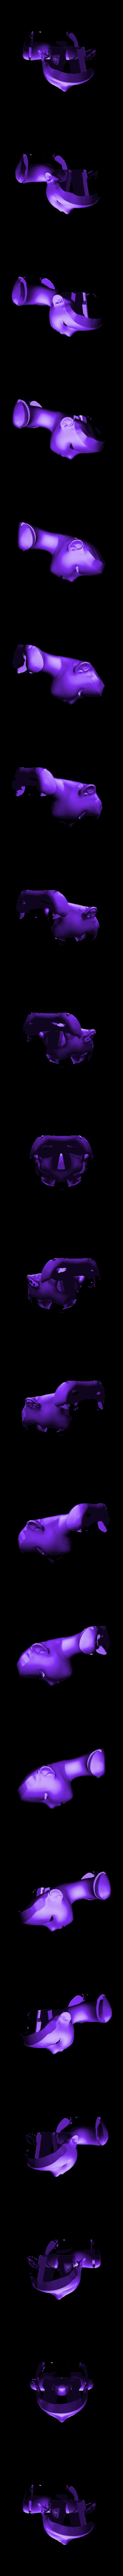 head.stl Download free STL file sagesumi remix • 3D printable model, CyberCyclist